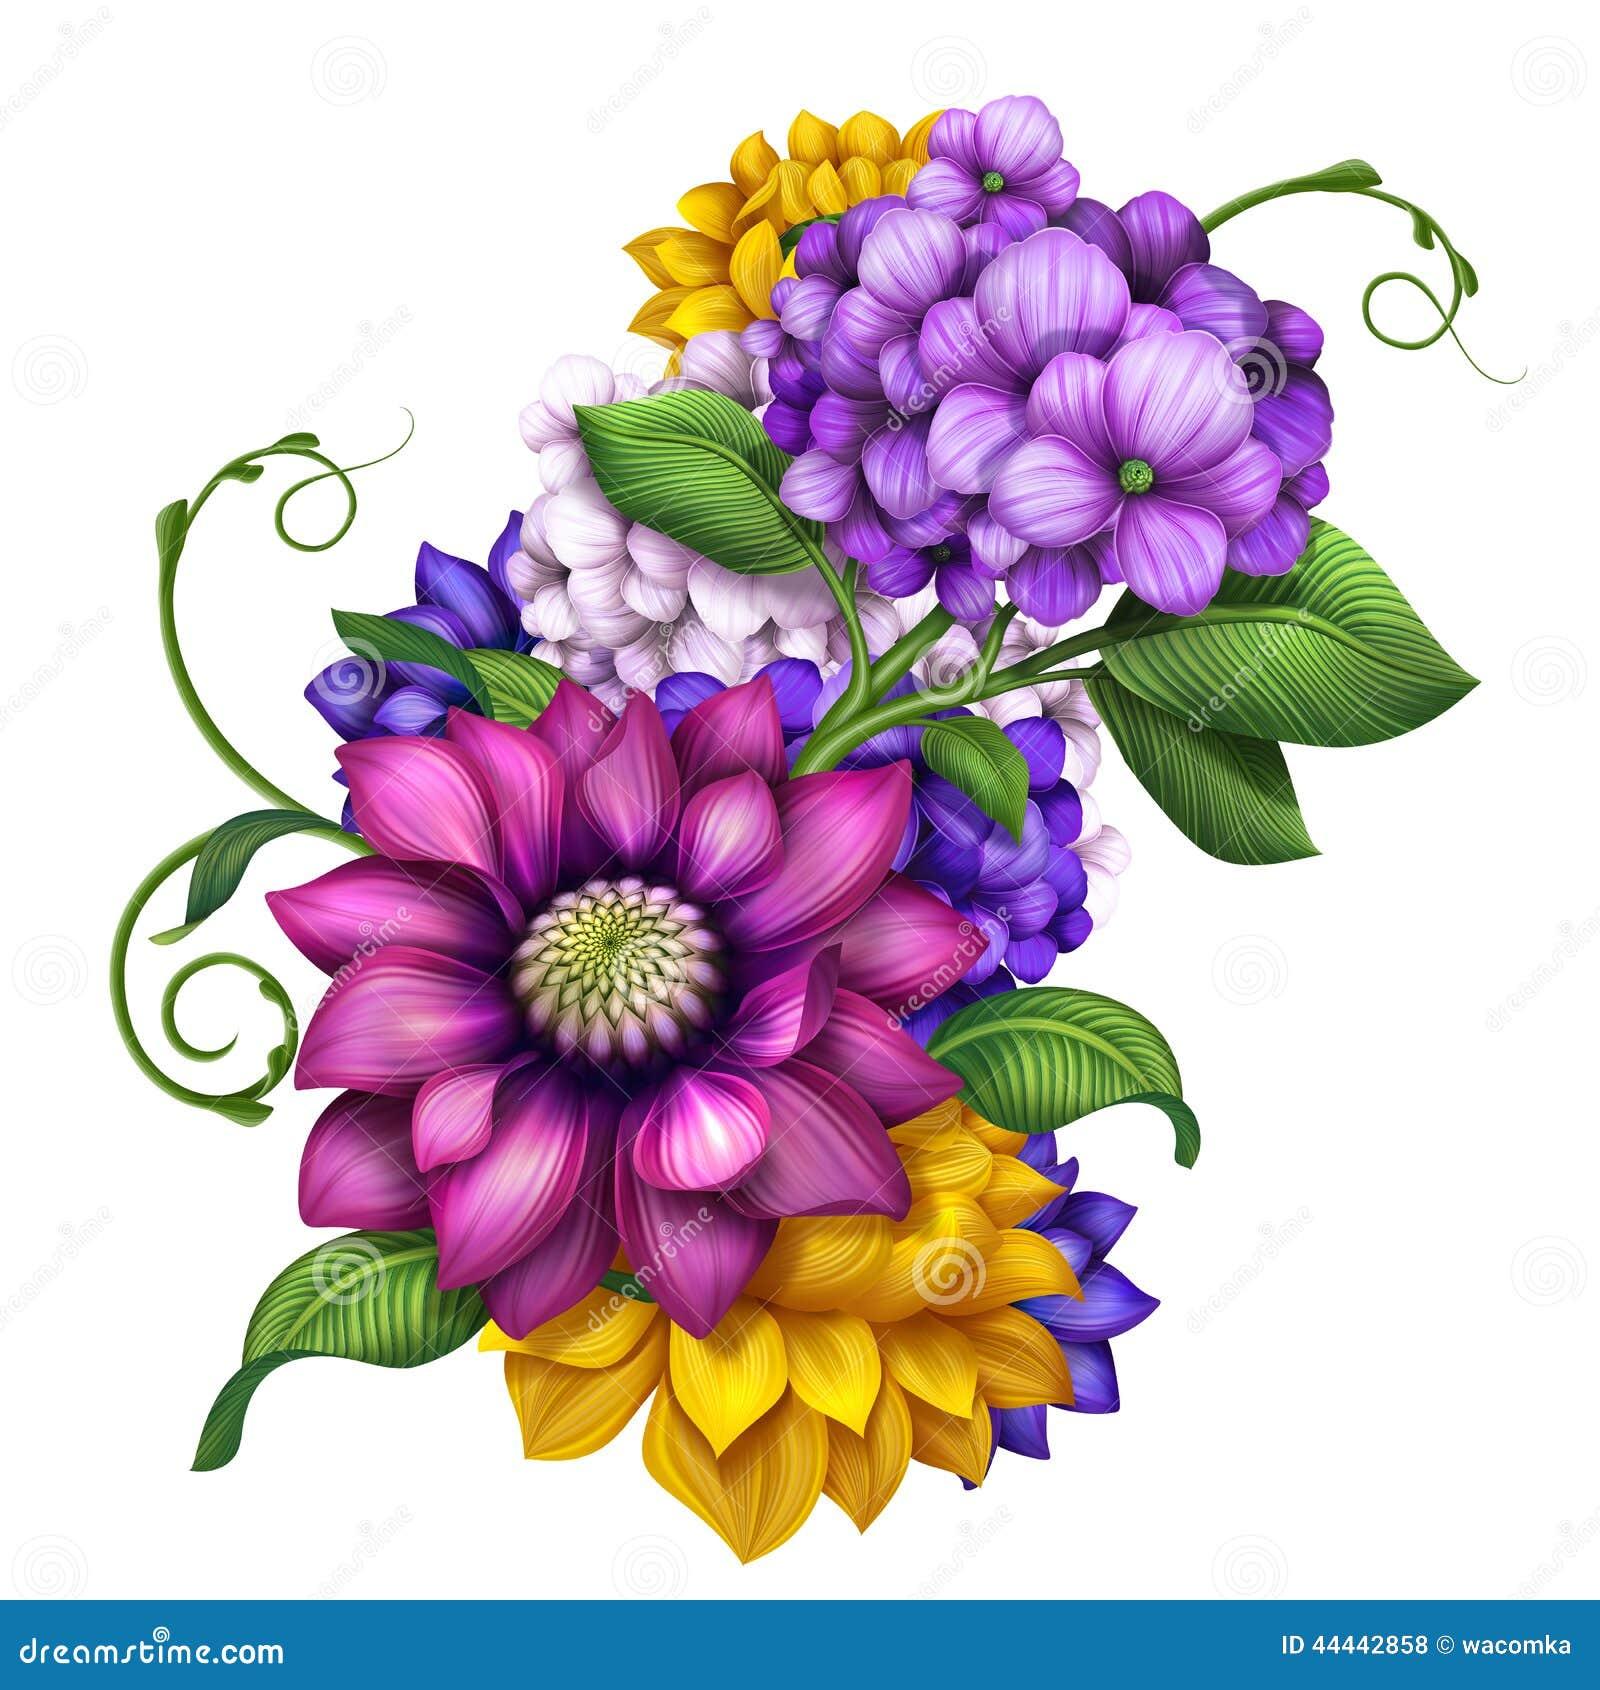 Assorted Colorful Autumn Flowers Clip Art Illustration ...